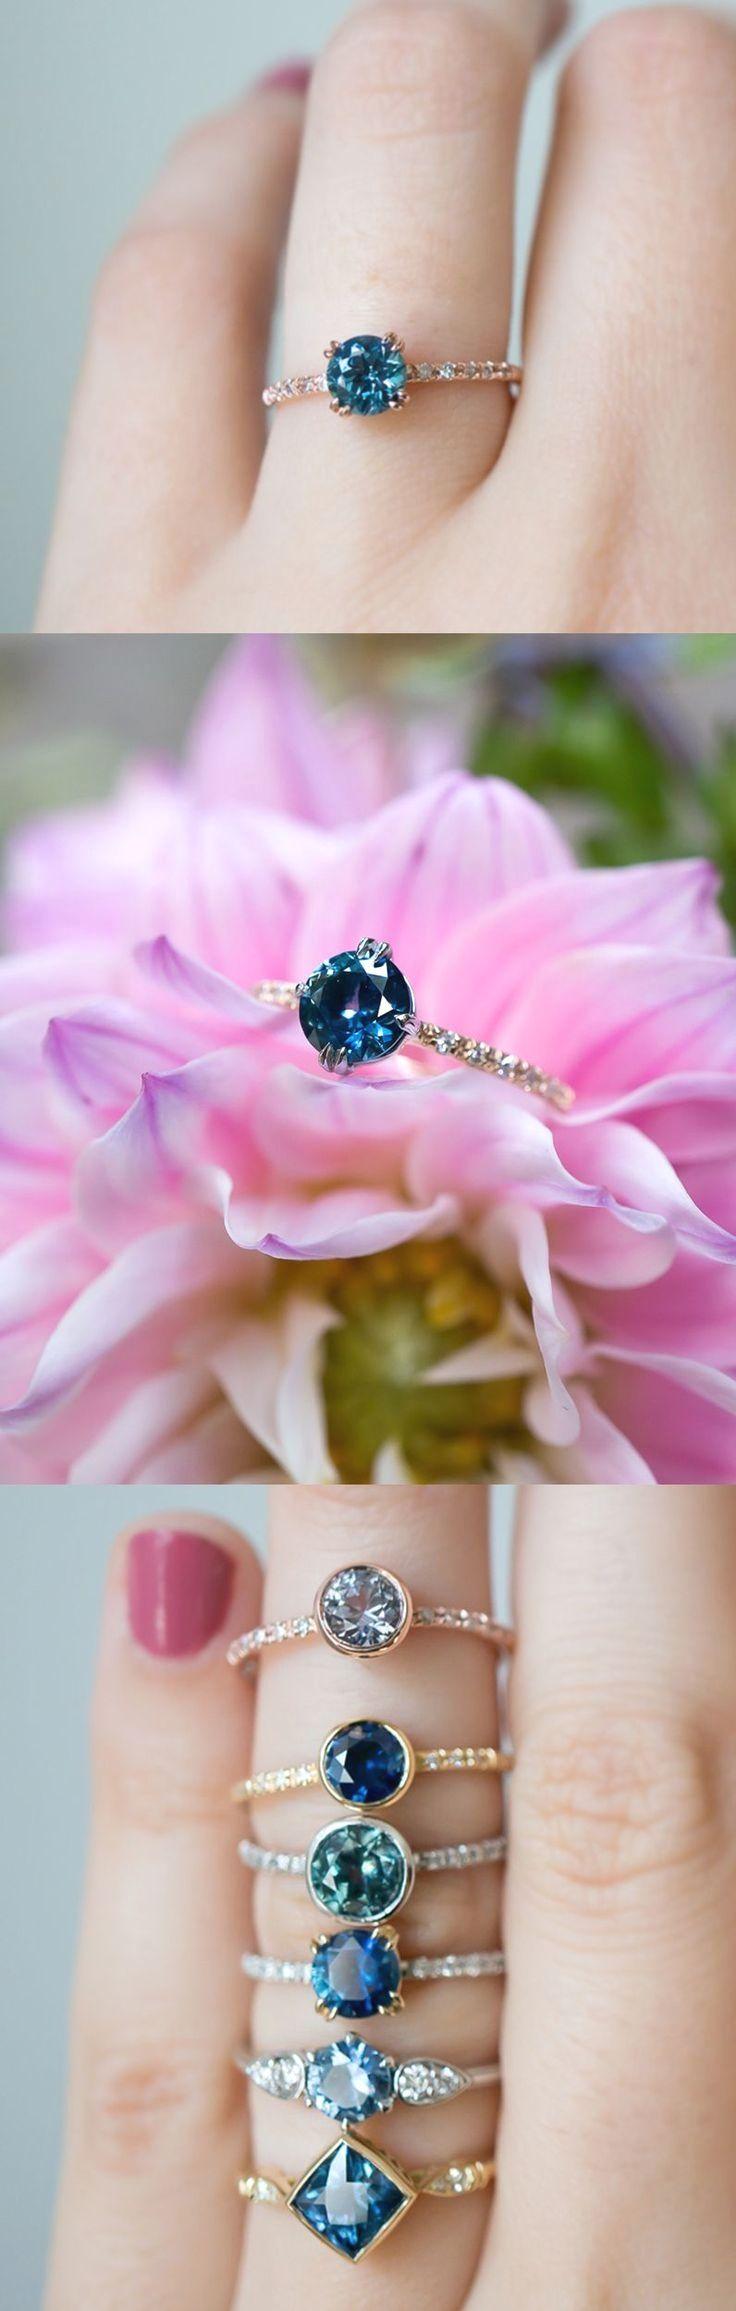 Deep Blue Montana Sapphire Engagement Ring | Sapphire engagement ...